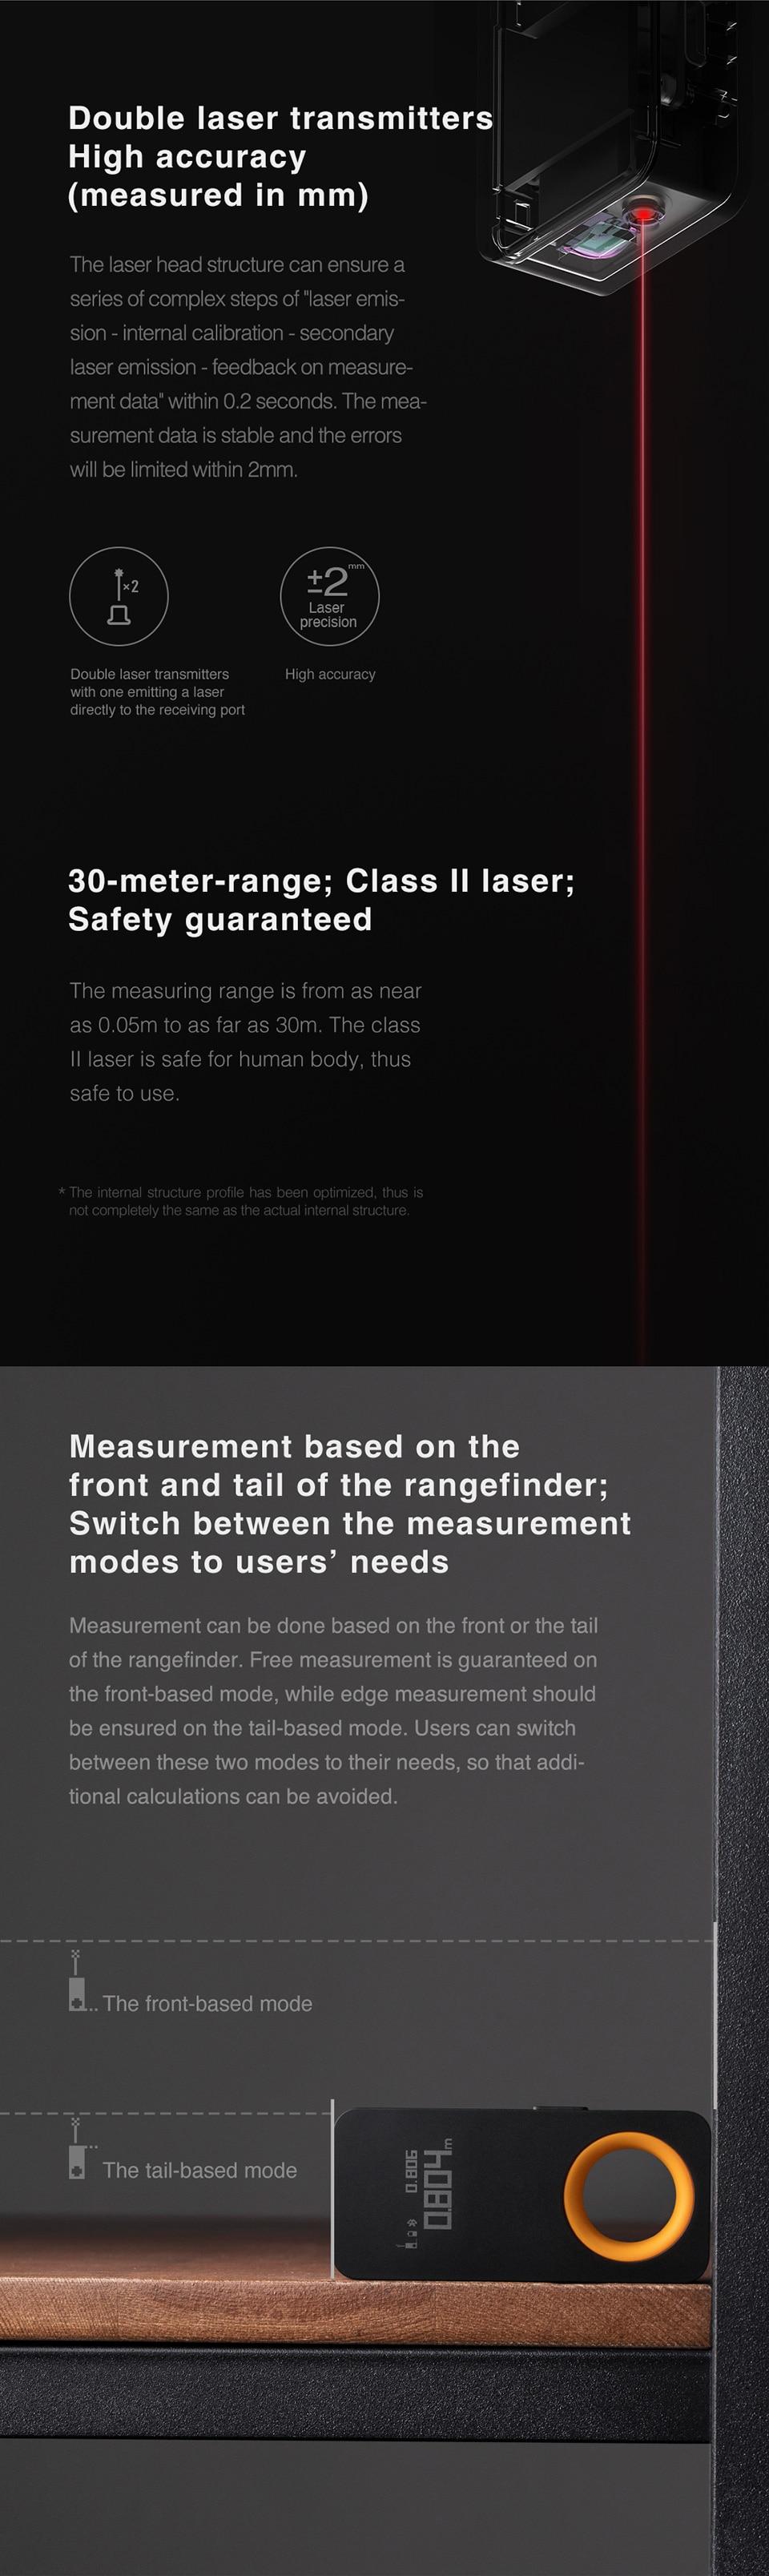 H474443333e3b441aaf3d33950e0d5222L - ตลับเมตรเลเซอร์ วัดระยะทาง Rangefinder 30M หน้าจอแสดงผล OLED วัดระยะห่างด้วยแสงเลเซอร์ เชื่อมต่อโทรศัพท์มือถือ